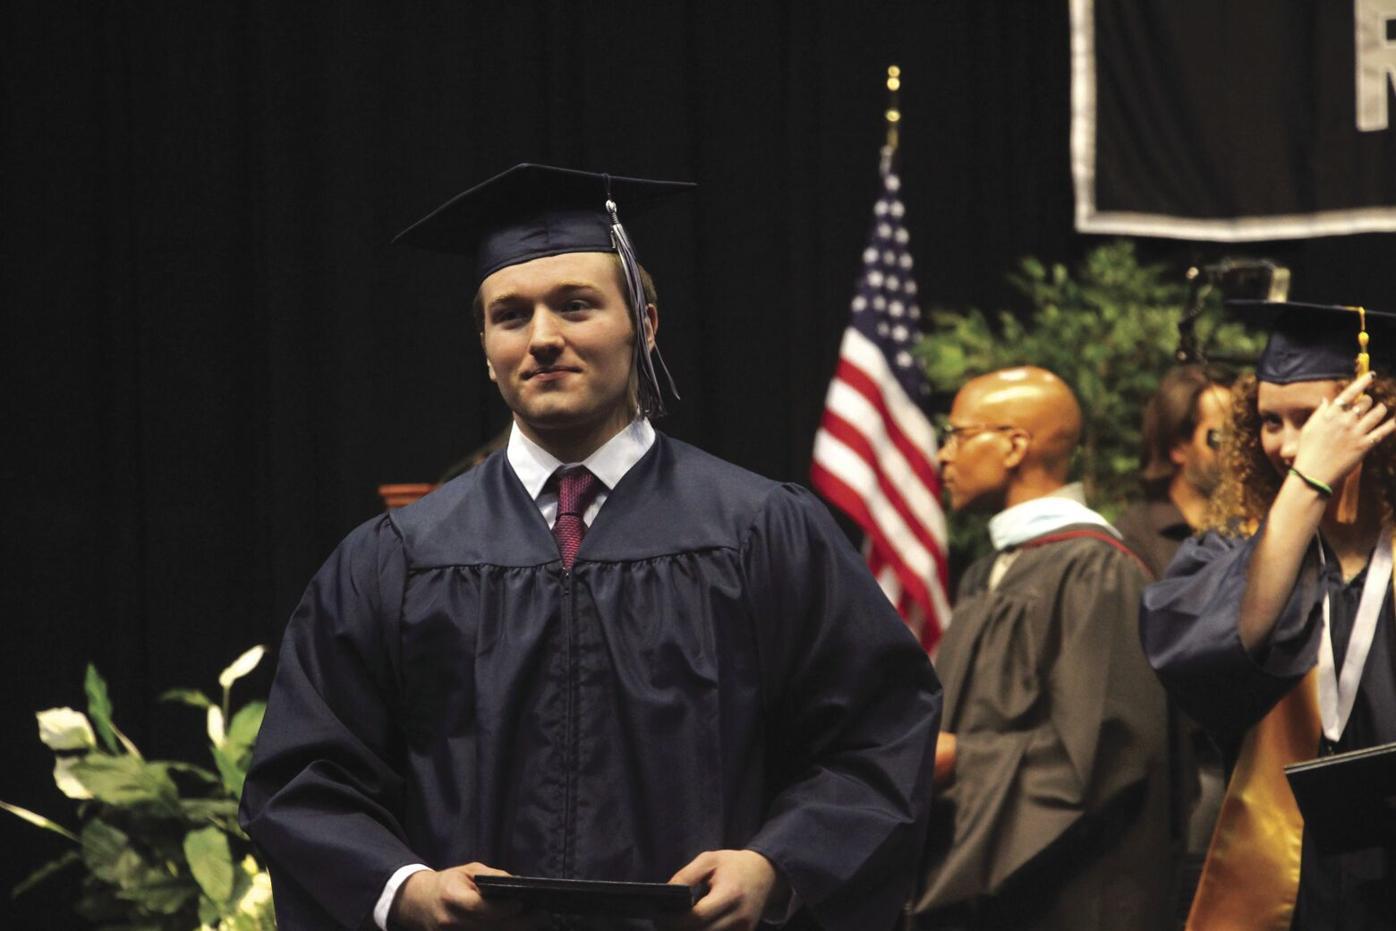 CPHS Graduation 6-6 Brandon Narine.jpg